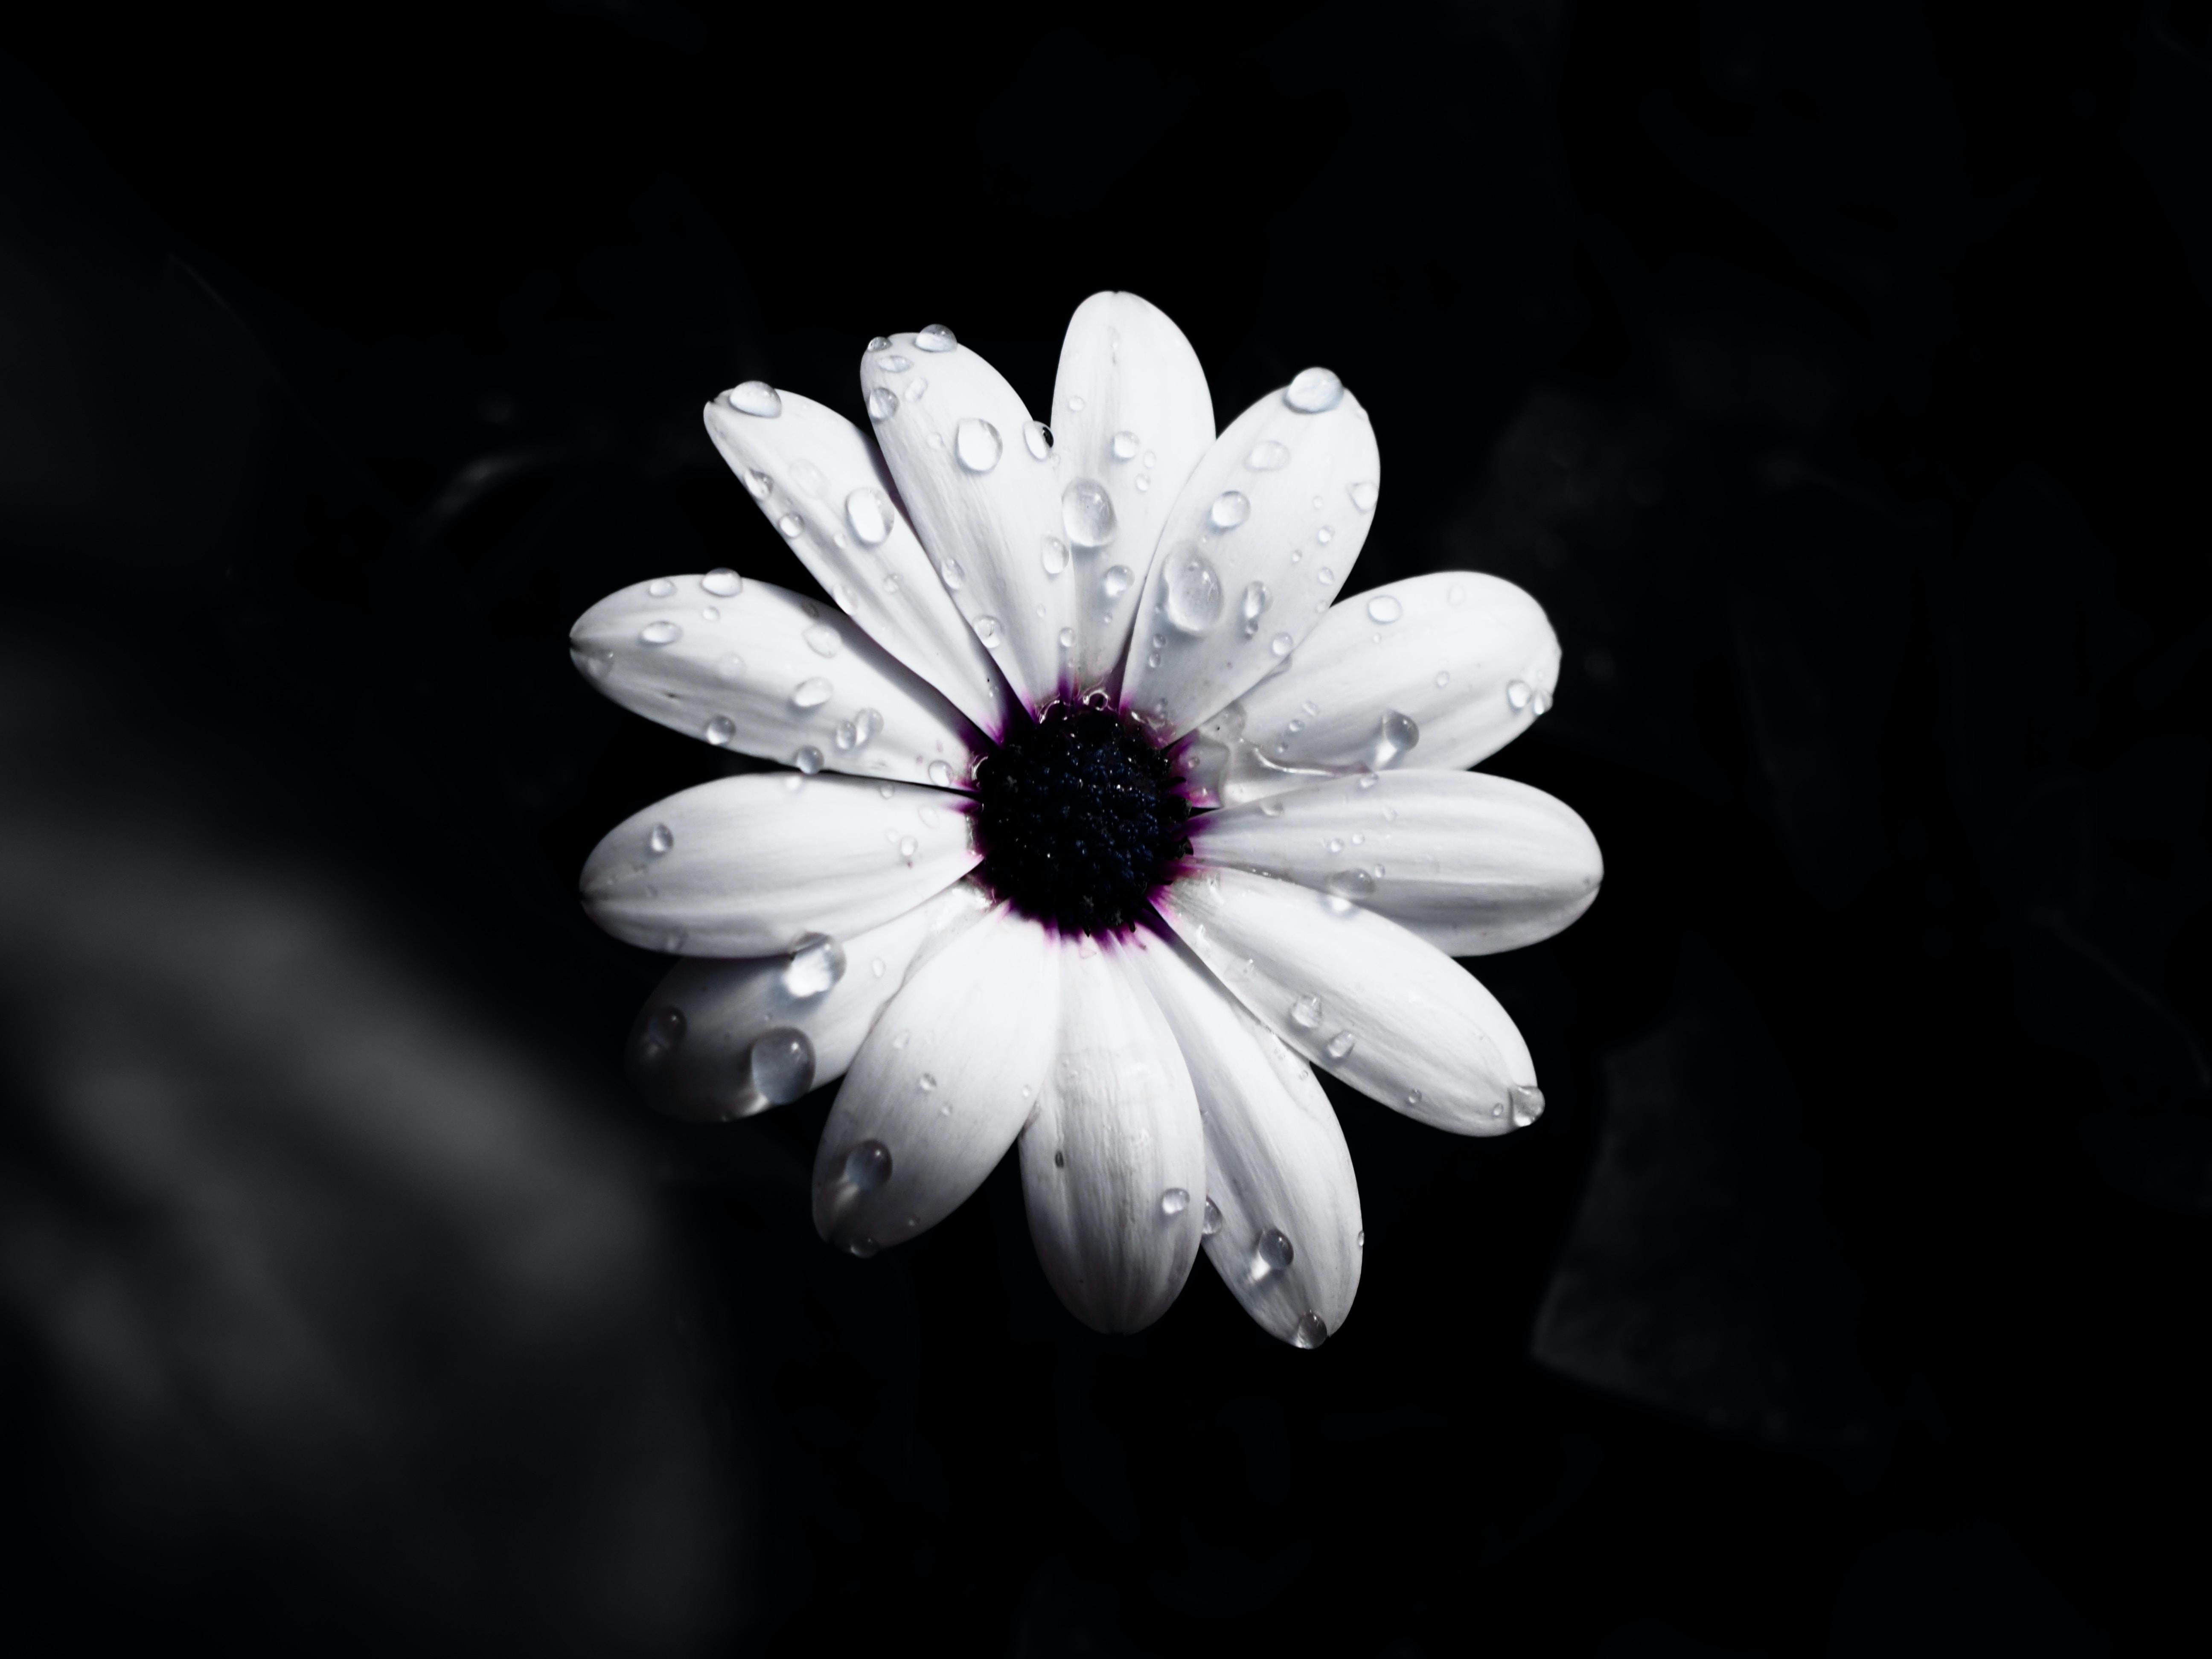 photo of white daisy flower